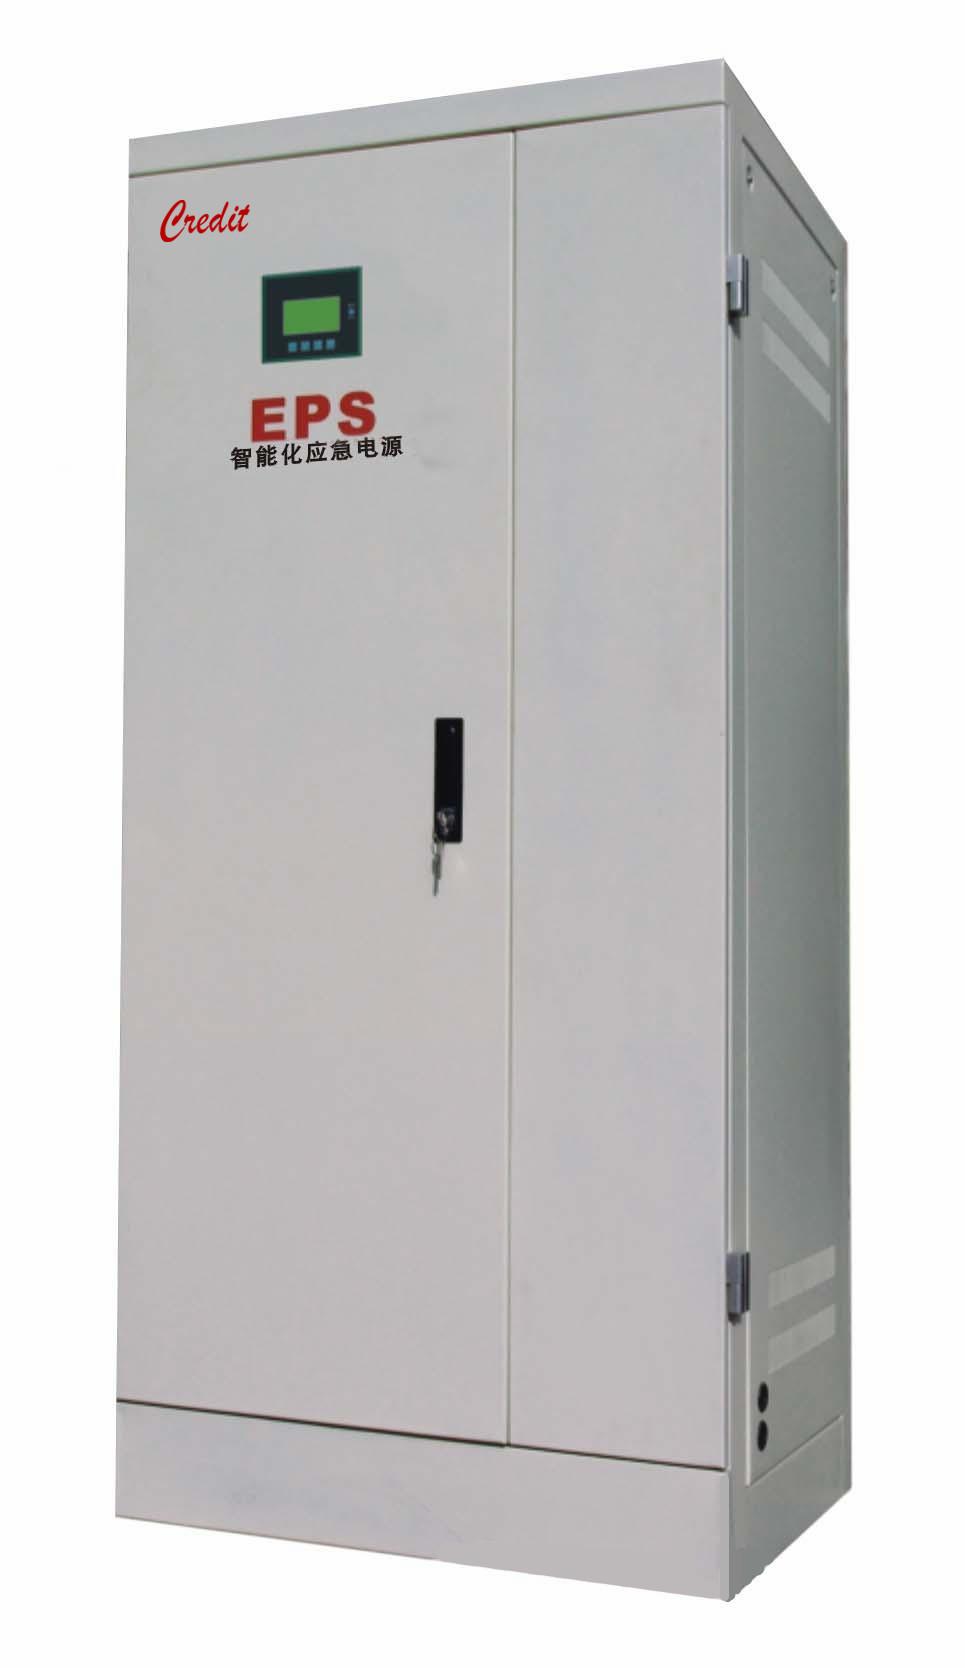 烏魯木齊EPS應急電源品牌|嘉雲電子口碑好的烏魯木齊EPS應急電源_你的理想選擇